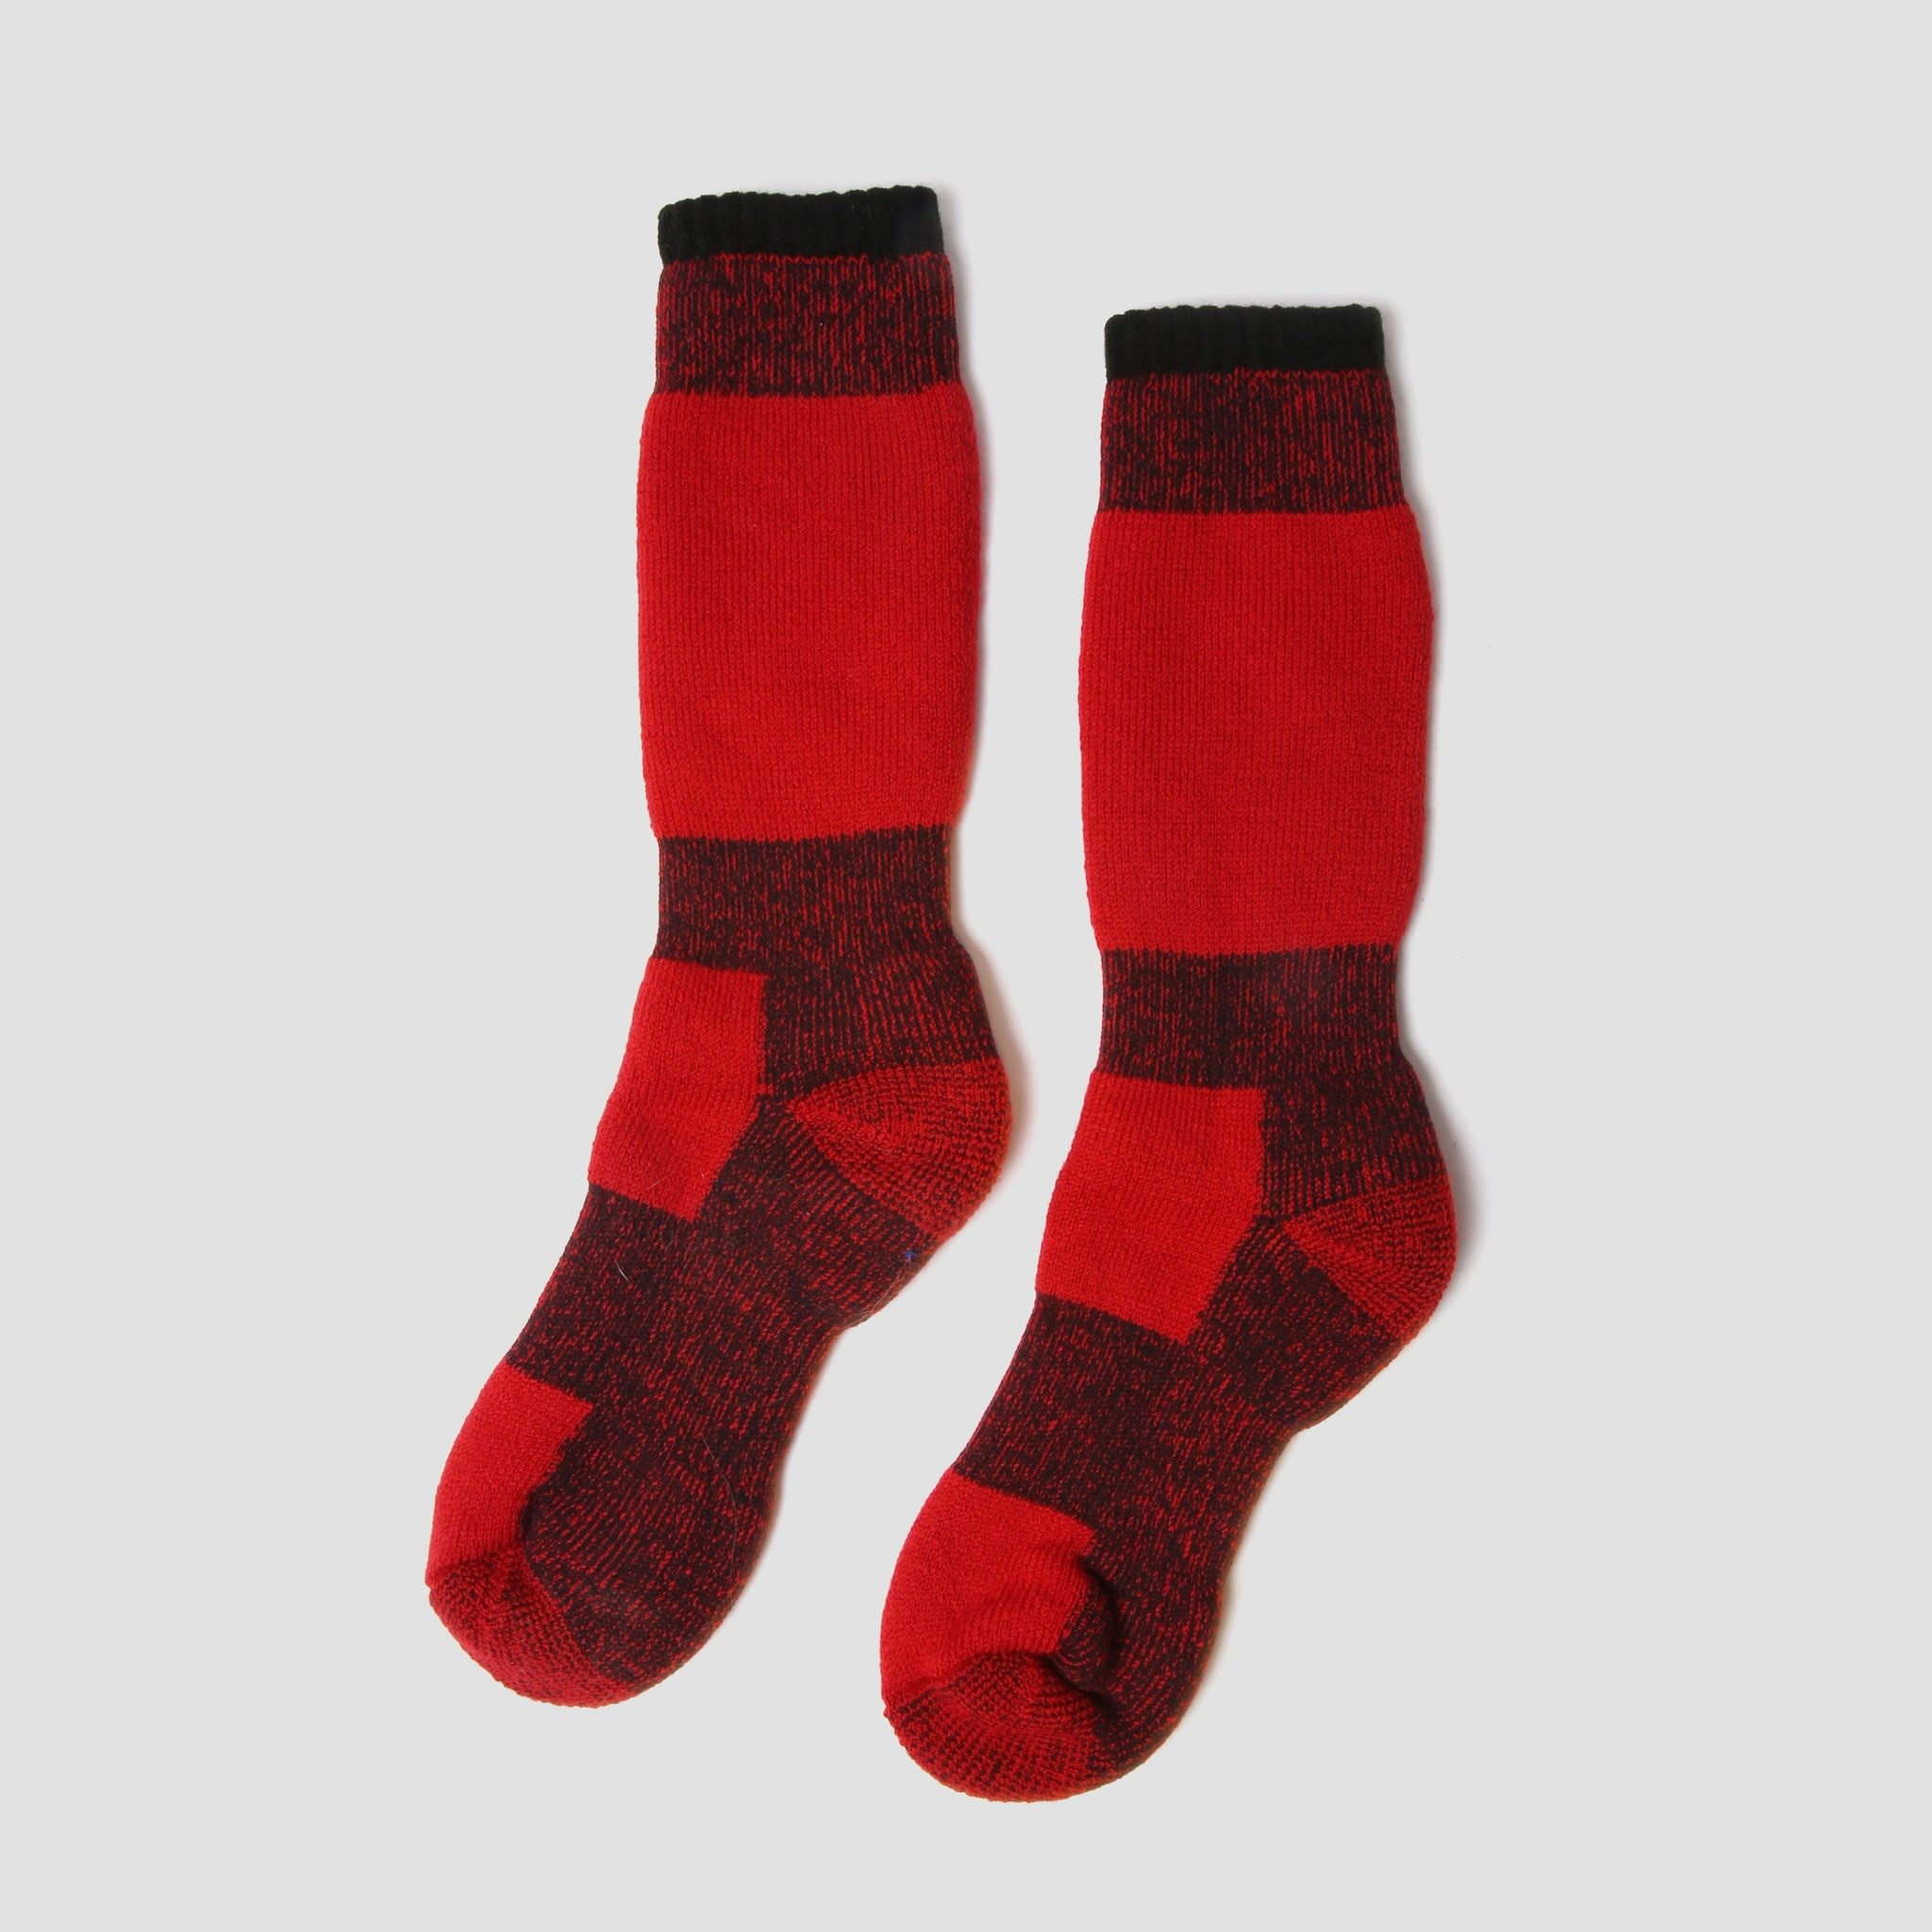 Muttonhead Backcountry Socks